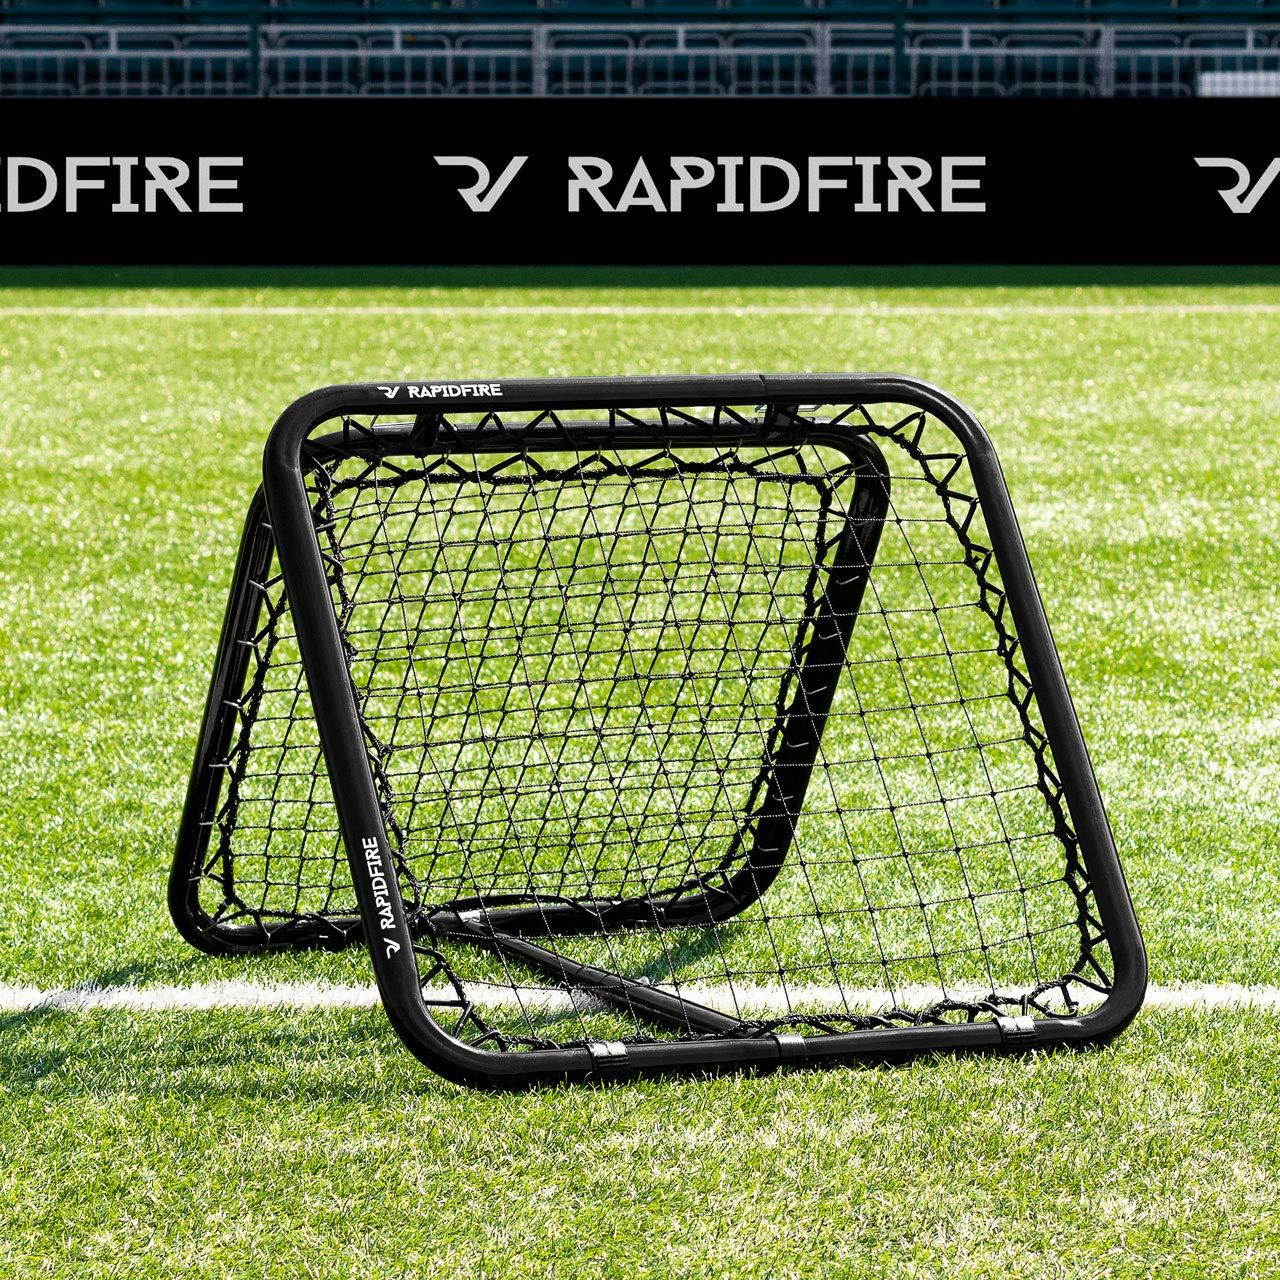 RapidFire 80 Rebounder [Multi-Sport] - Dual-Sided Rebound Net (100% Portable) by rapid-fire-2012